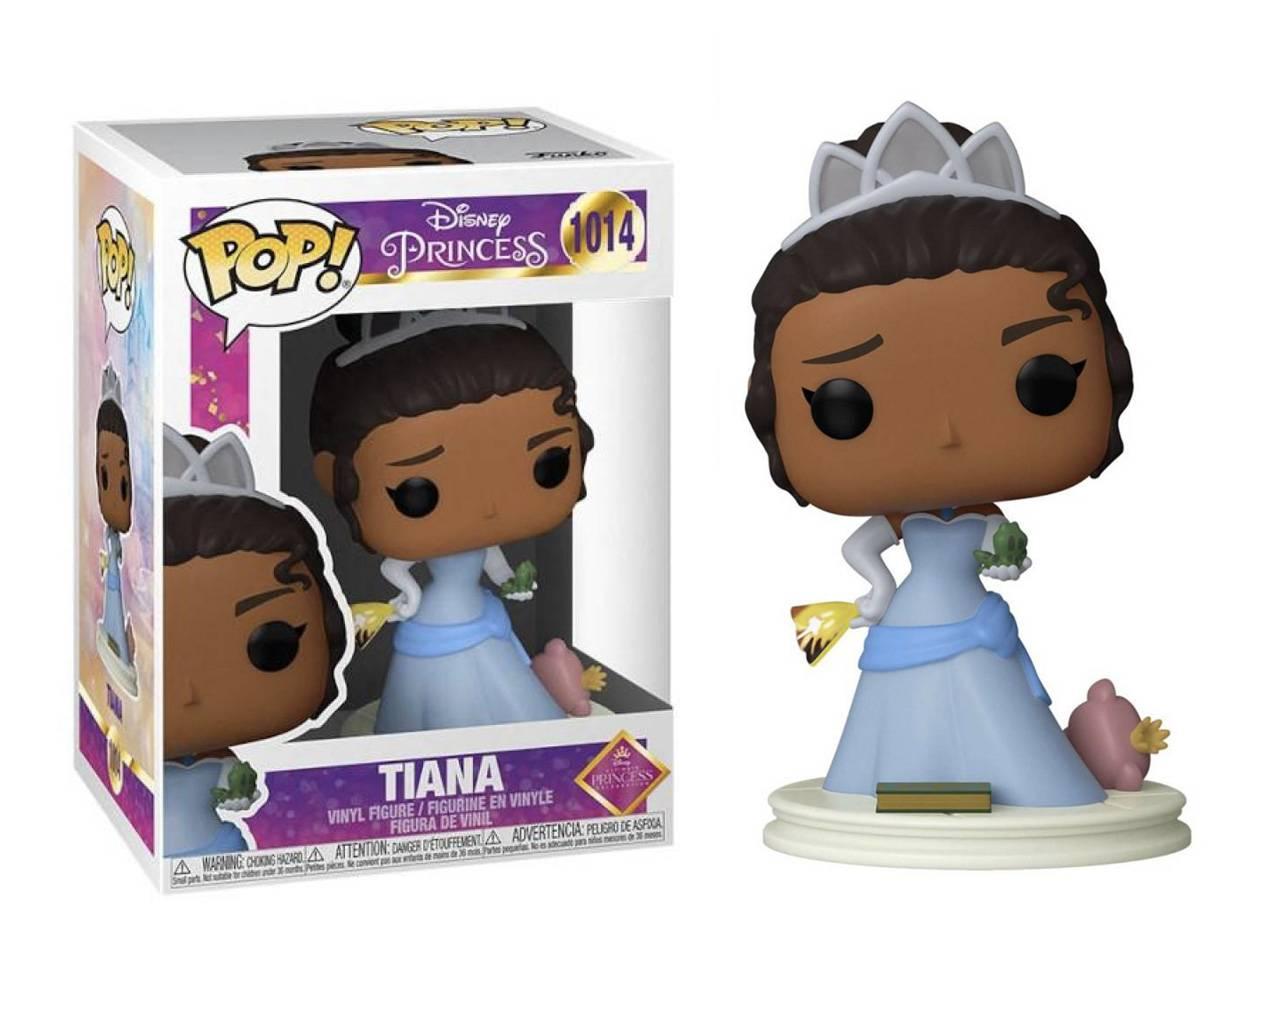 Tiana (Ultimate Princess Celebration) Pop! Vinyl